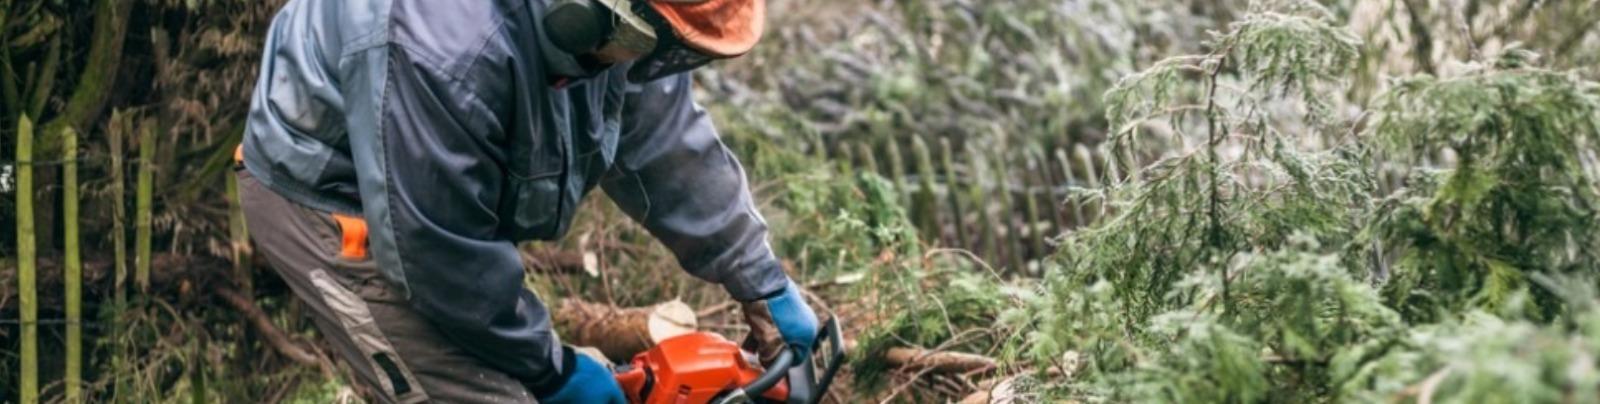 hickman brothers landscapes ltd  burford  witney  oxfordshire soft landscaping